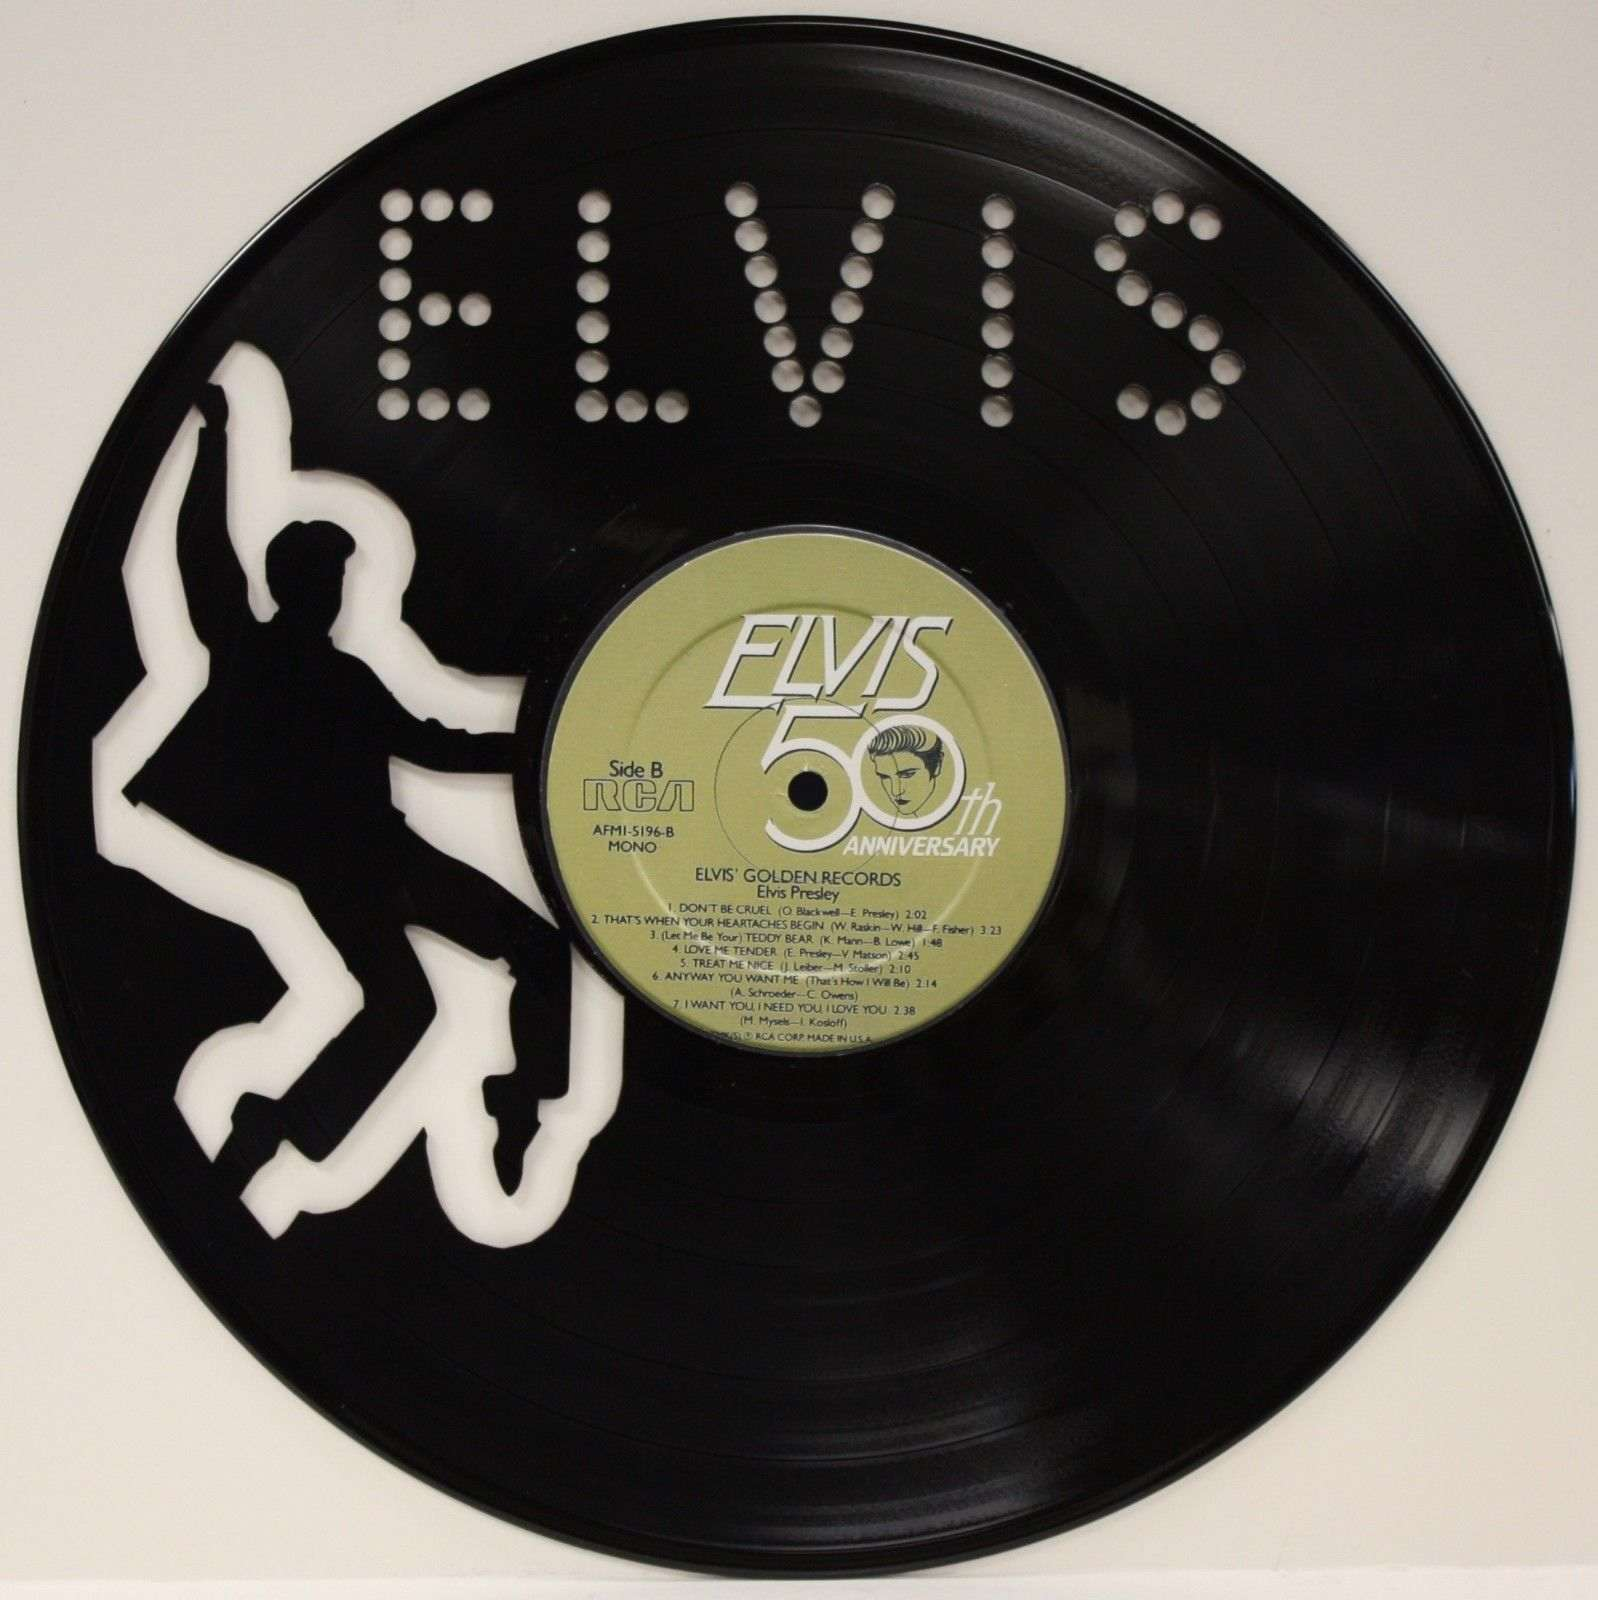 Elvis Presley Vinyl Lp Record Laser Cut Wall Art Display